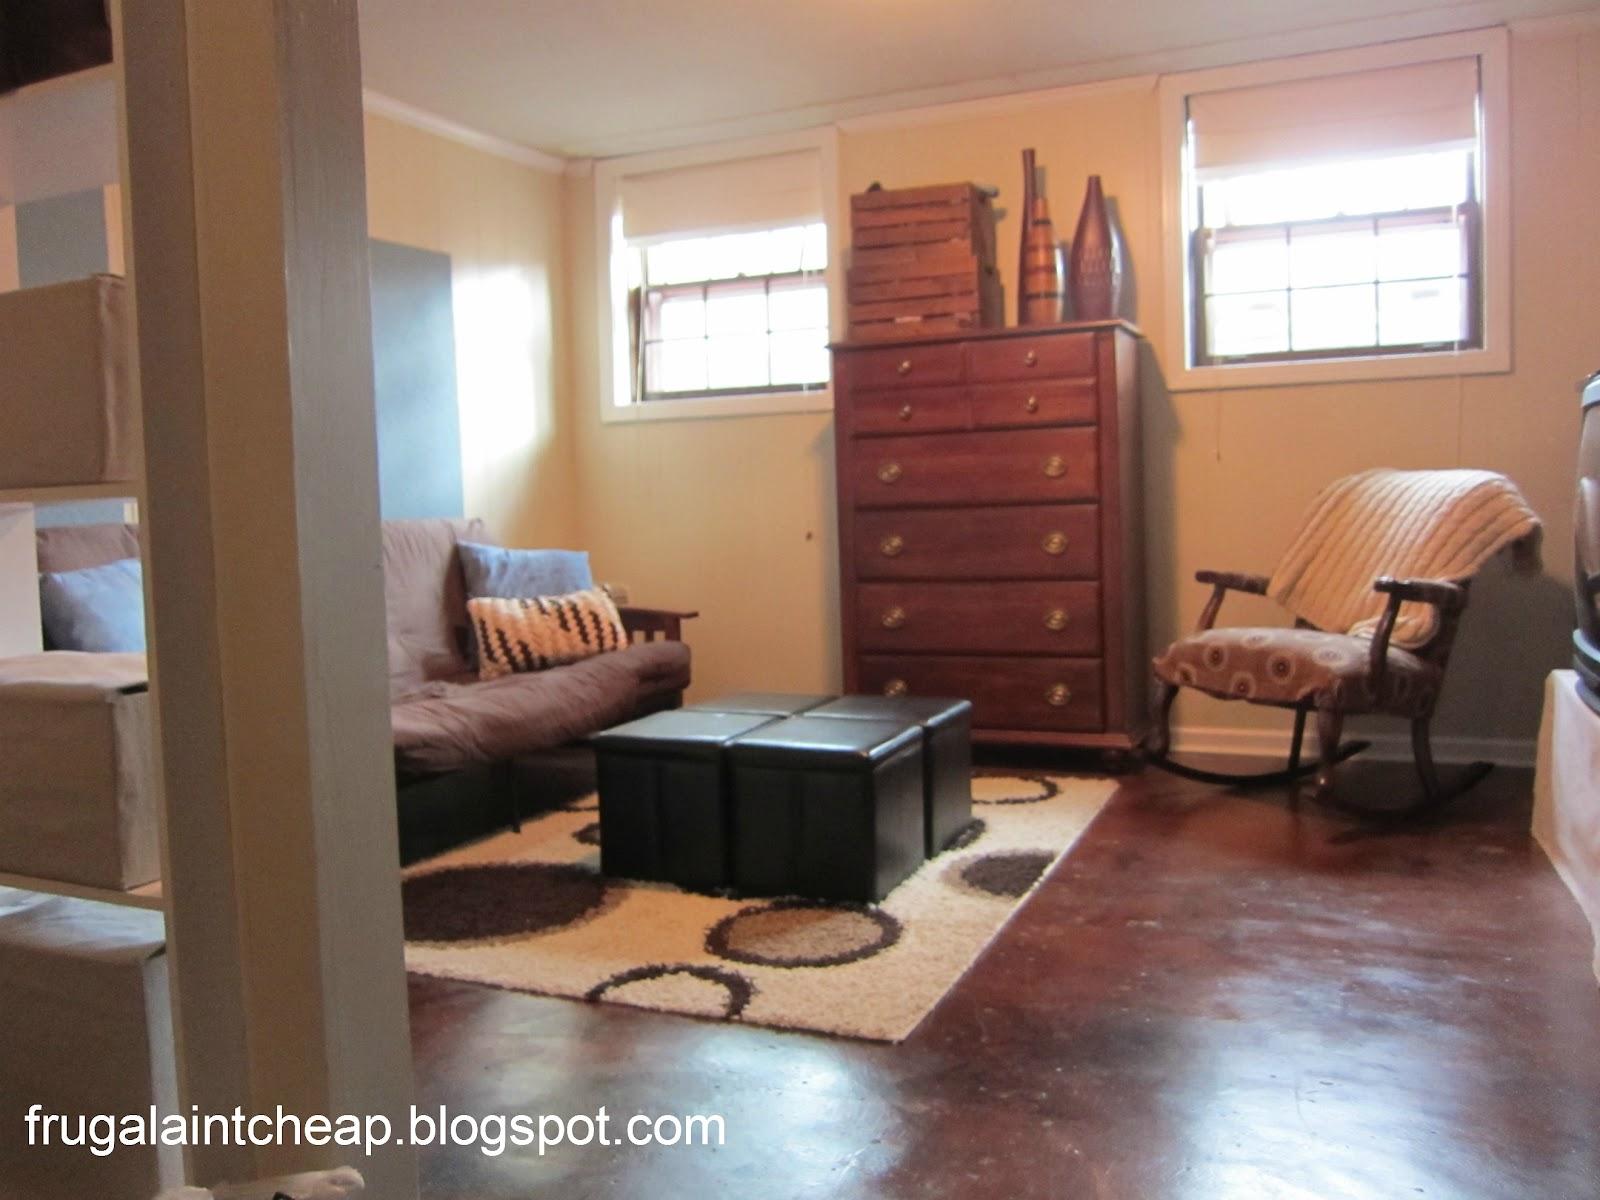 frugal ain't cheap: basement remodel